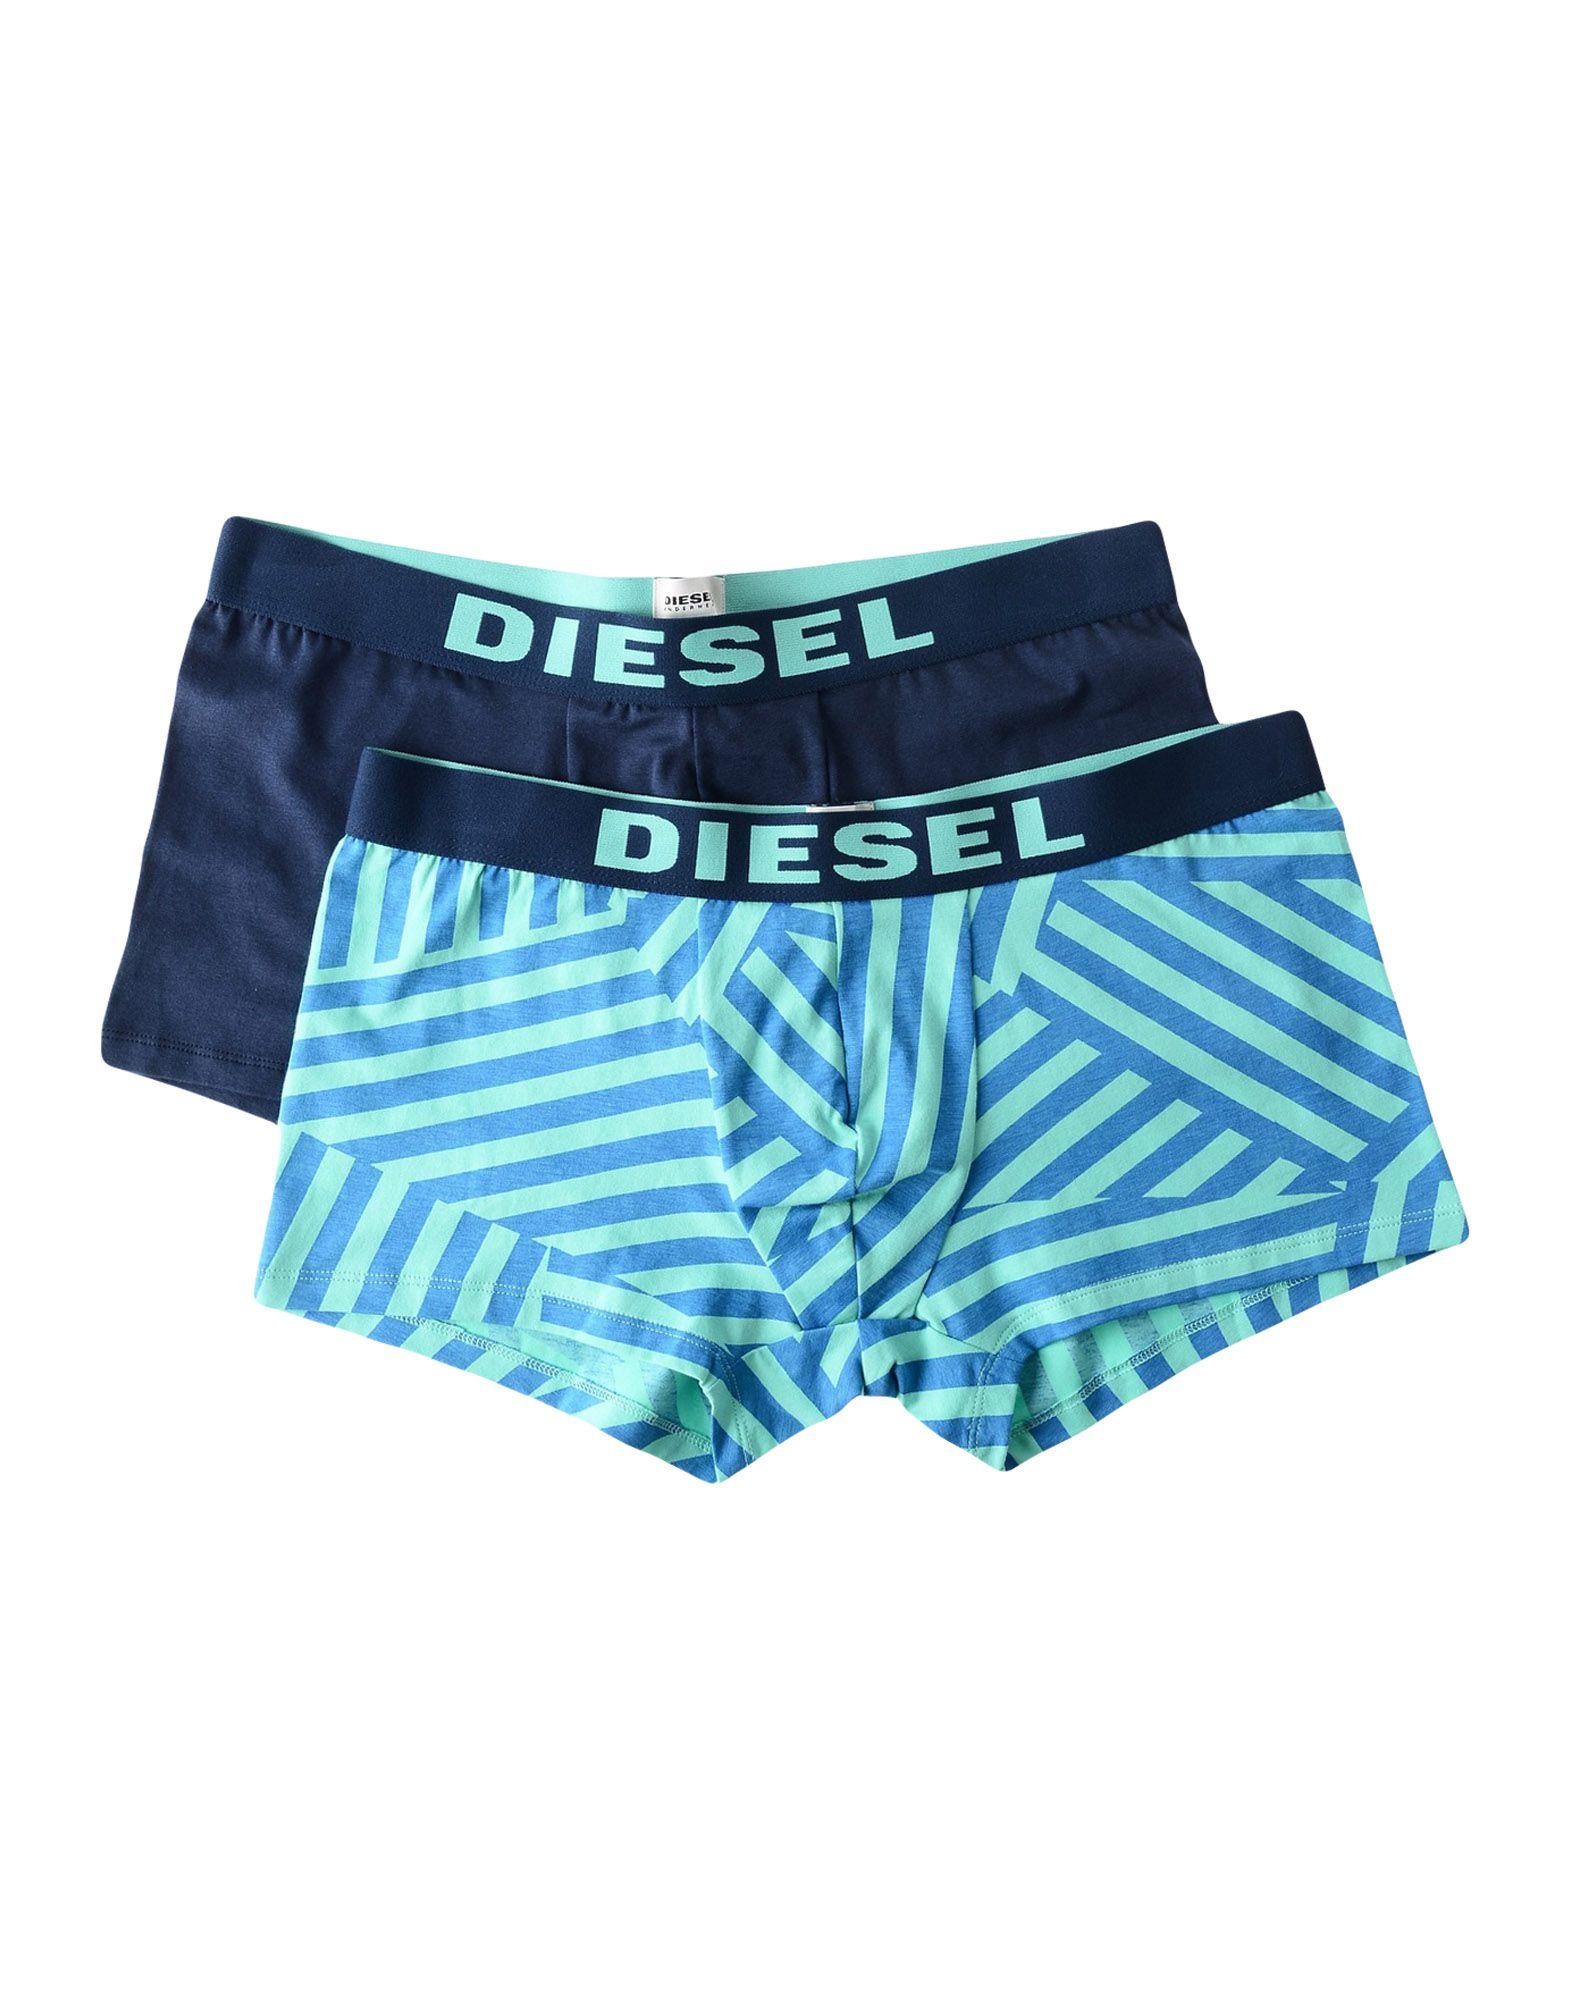 DIESEL Трусы трусы шорты diesel 00st5u 0kang 5gl